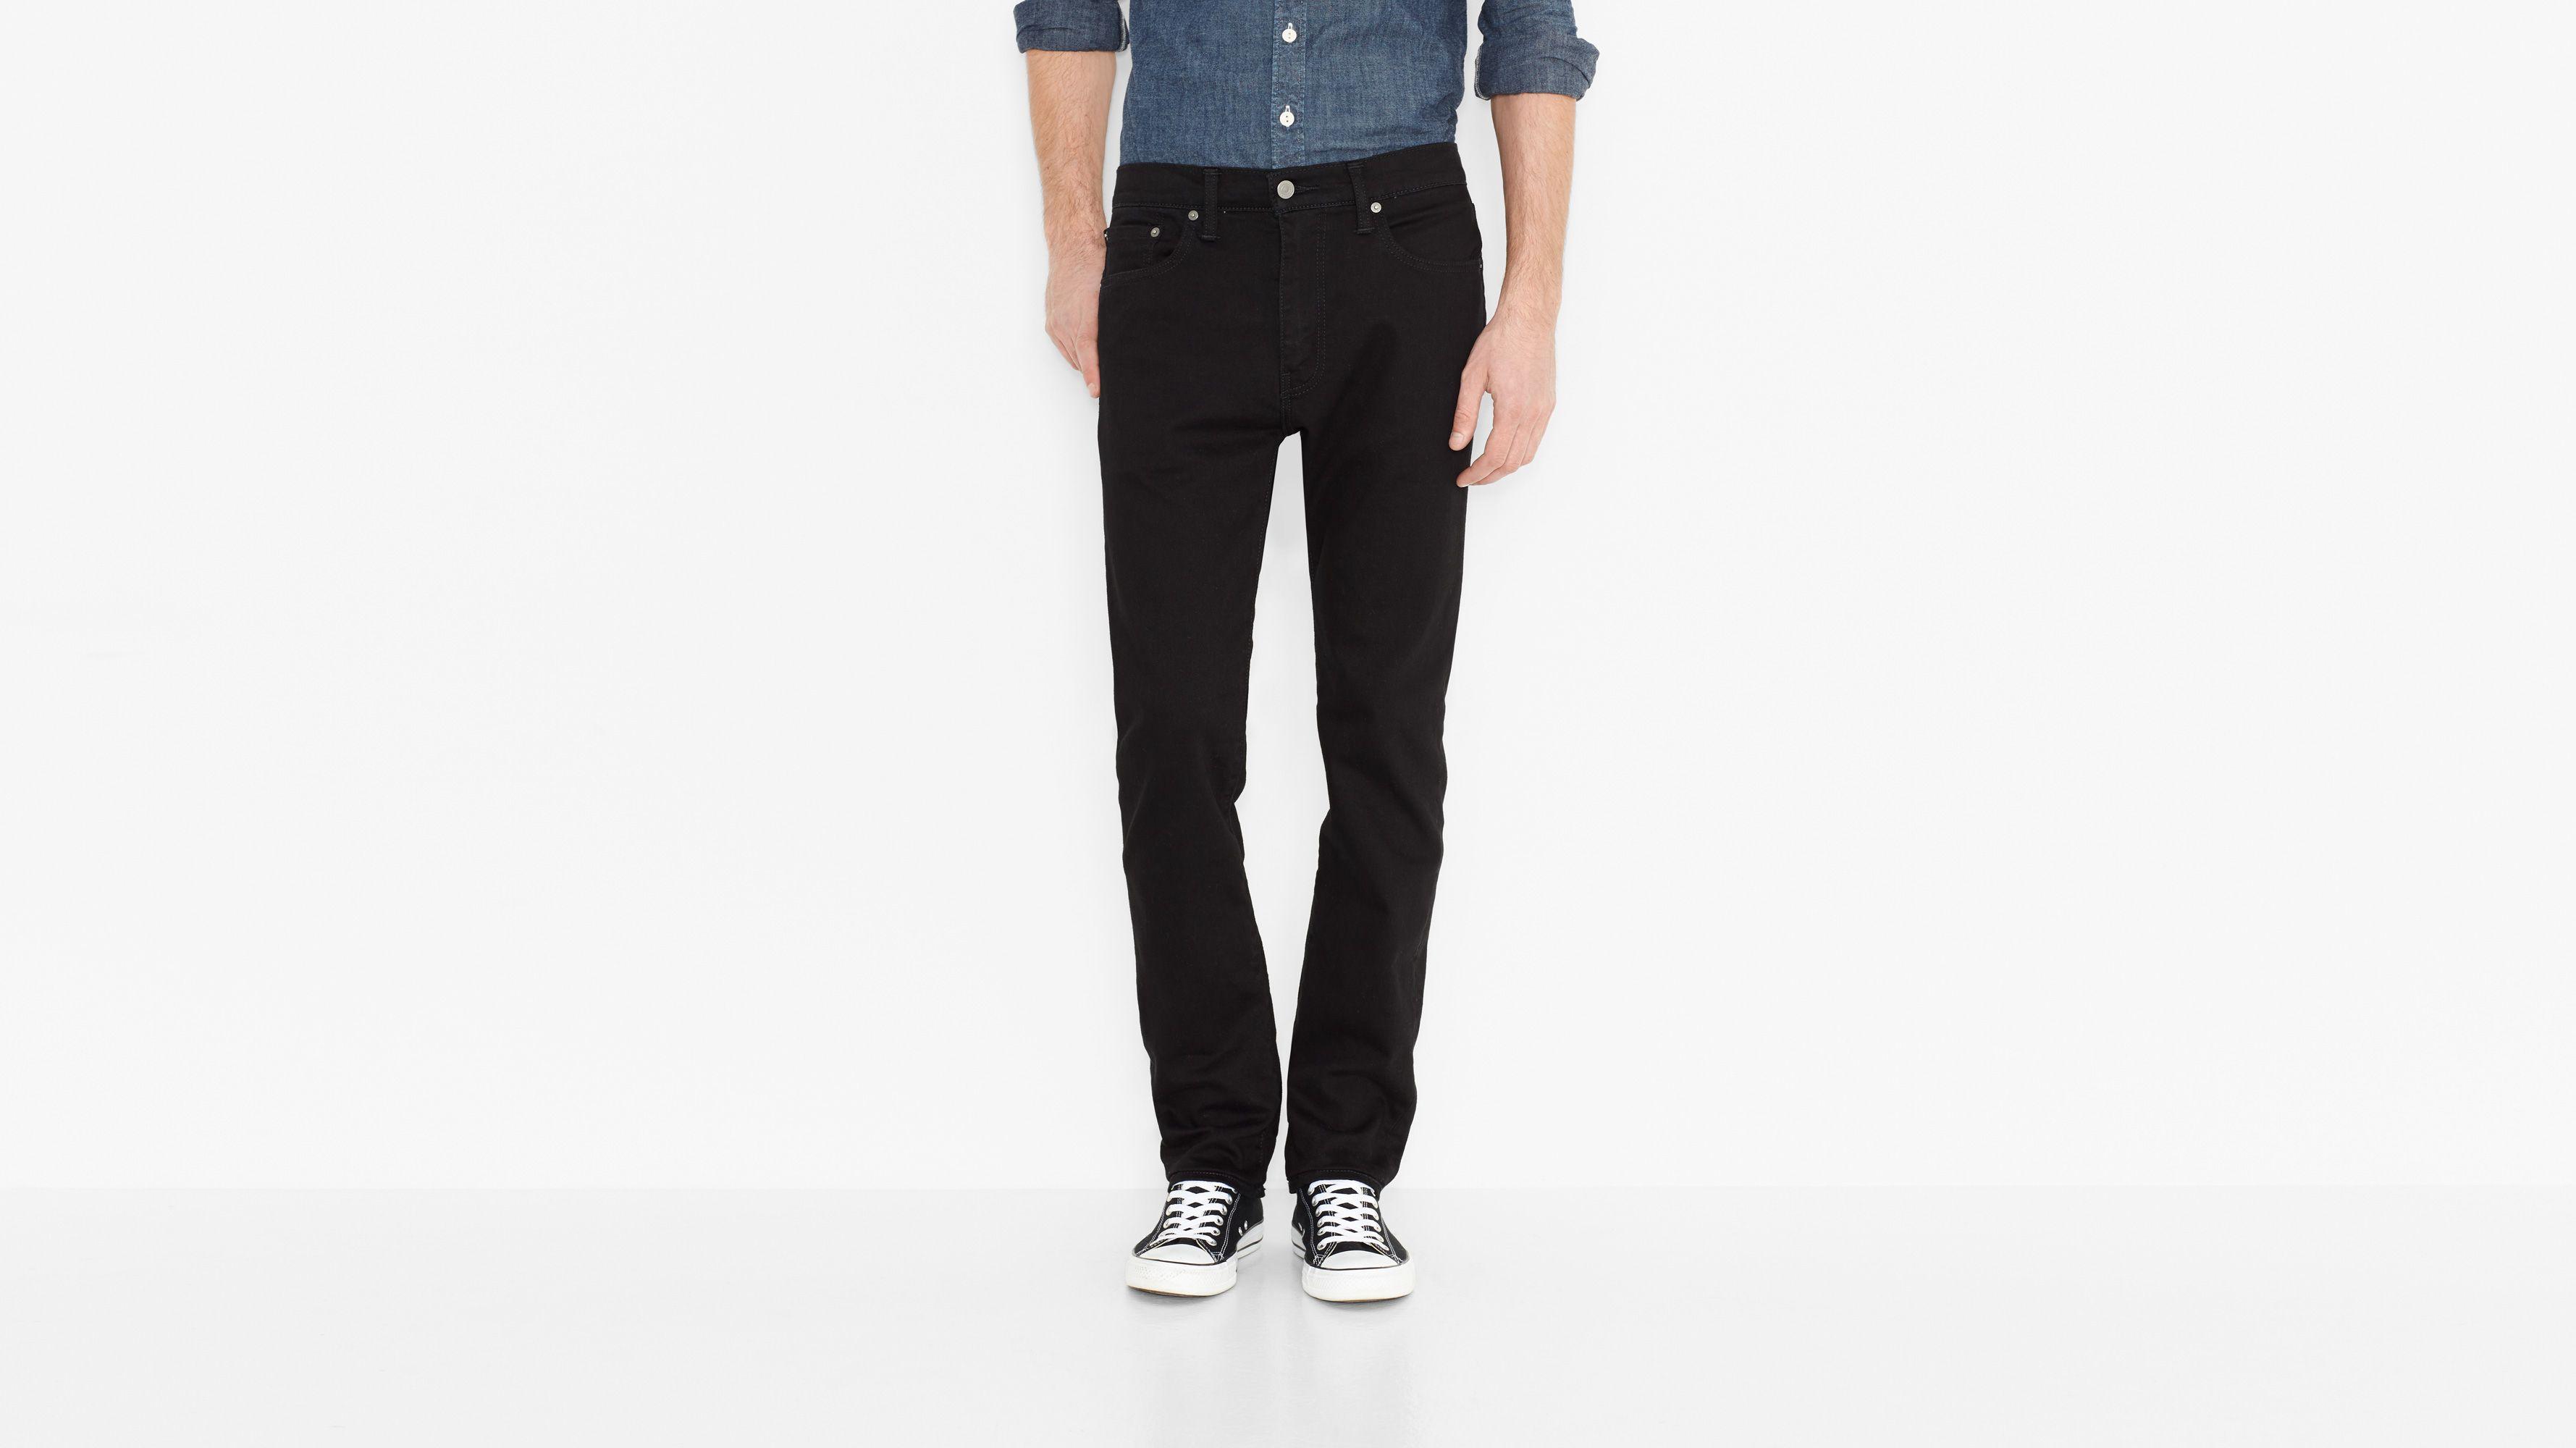 513™ Slim Straight Jeans - Nightshine